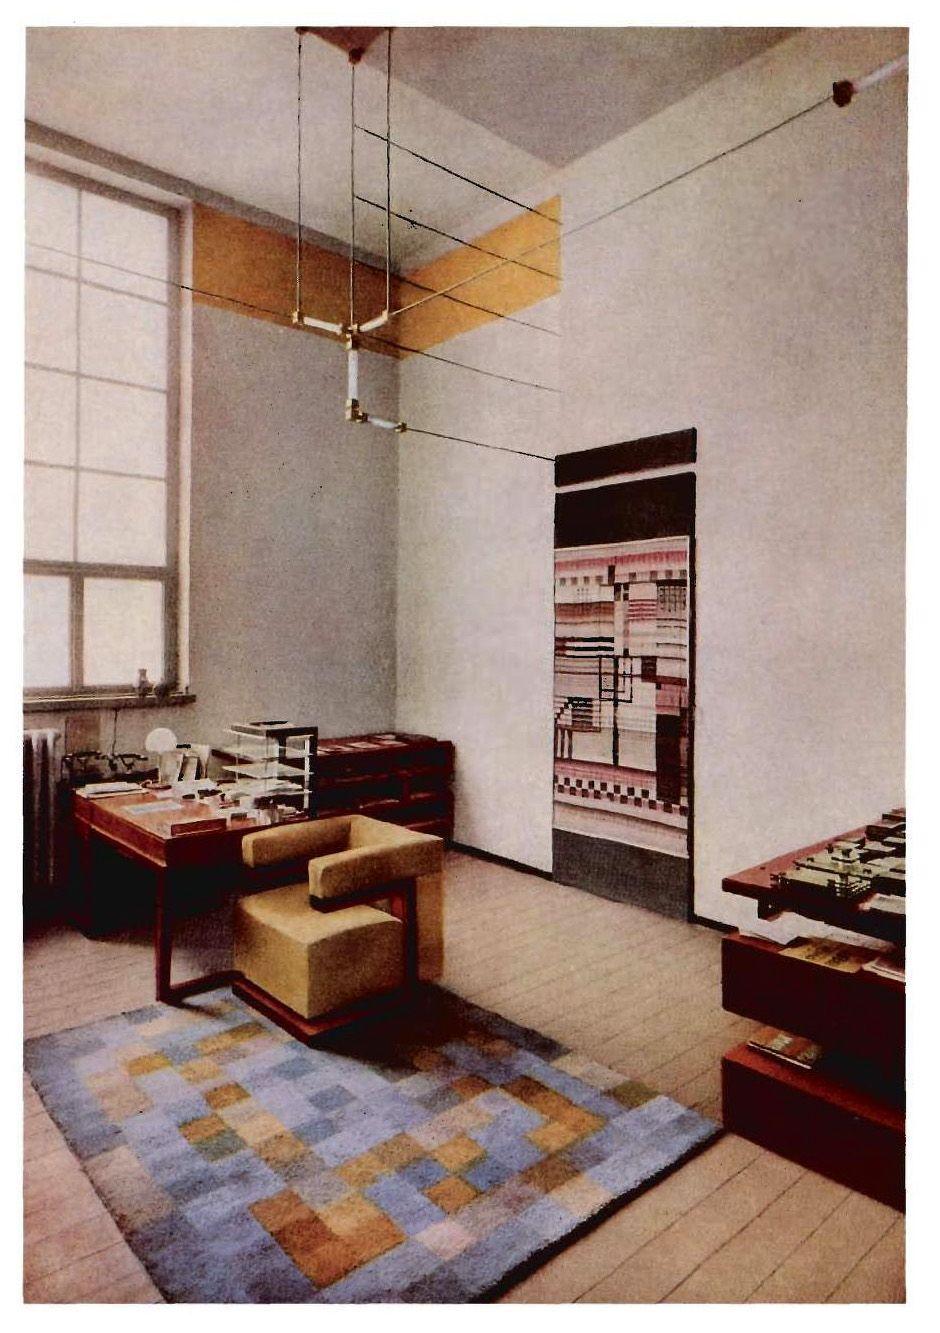 Inside Gropius' director's office at the Bauhaus, Dessau